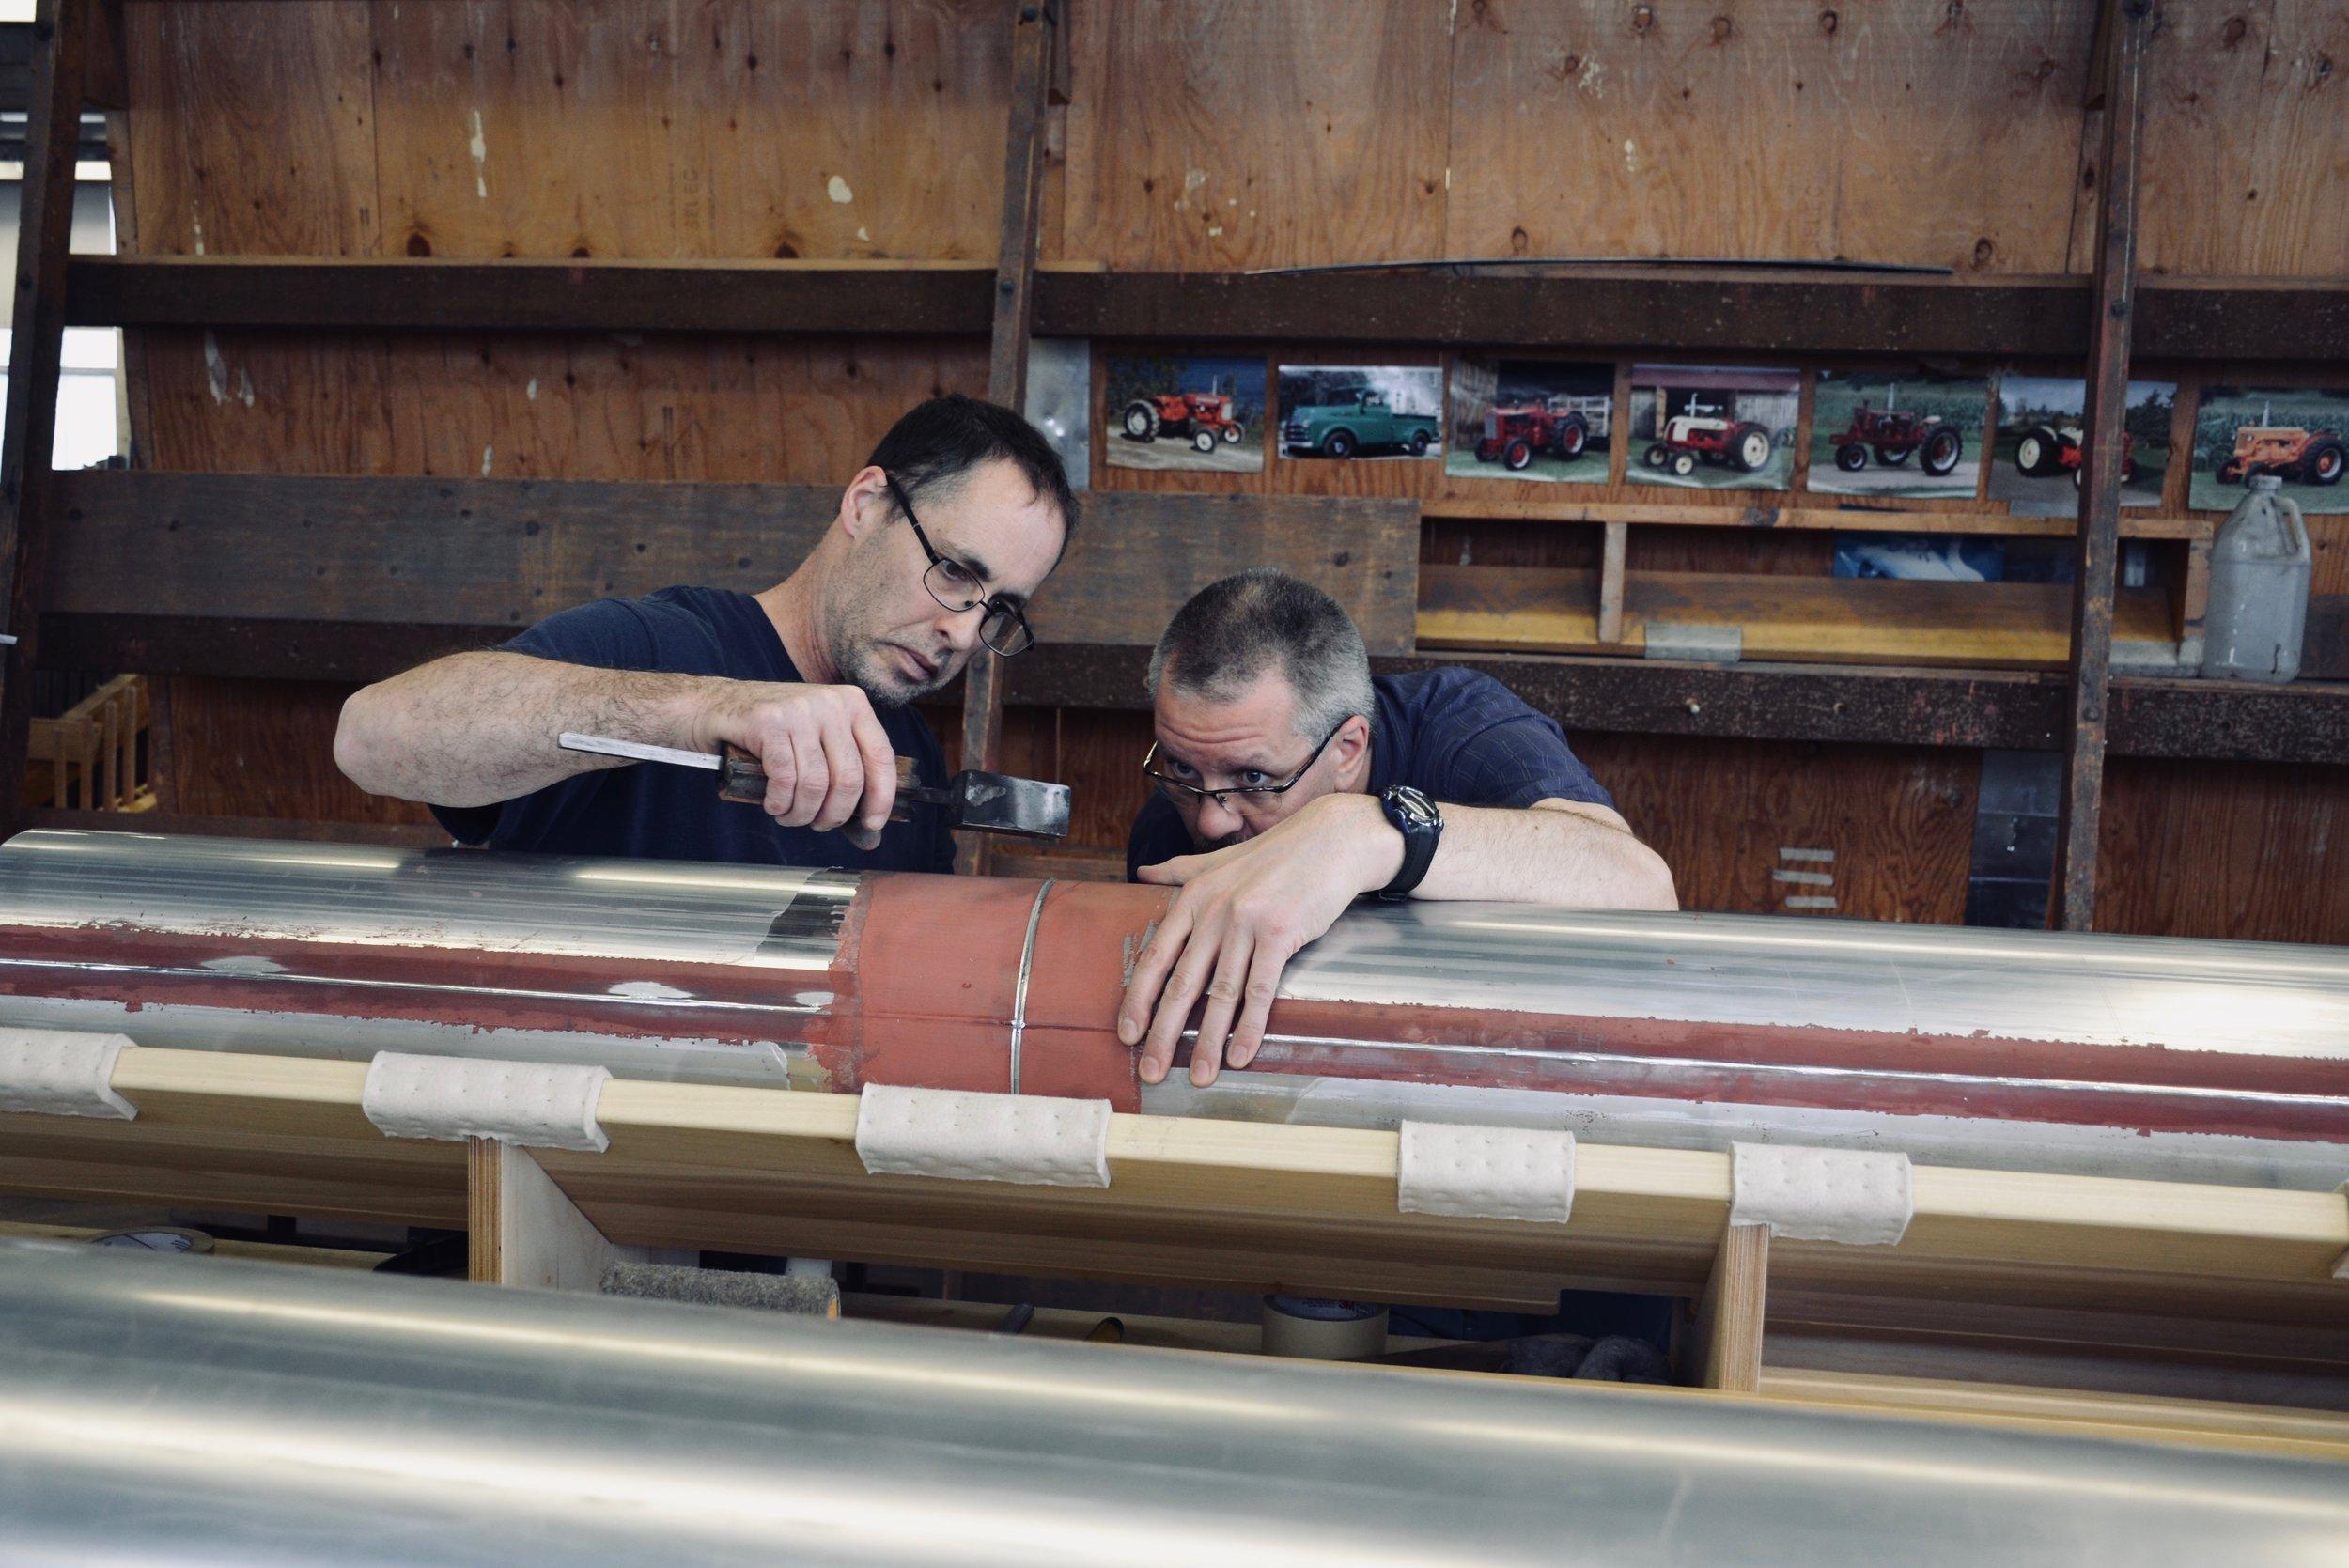 Pipe welding.Boston Organ Studio tour of the Casavant Pipe Organ Shop, St-Hyacinthe, Quebec